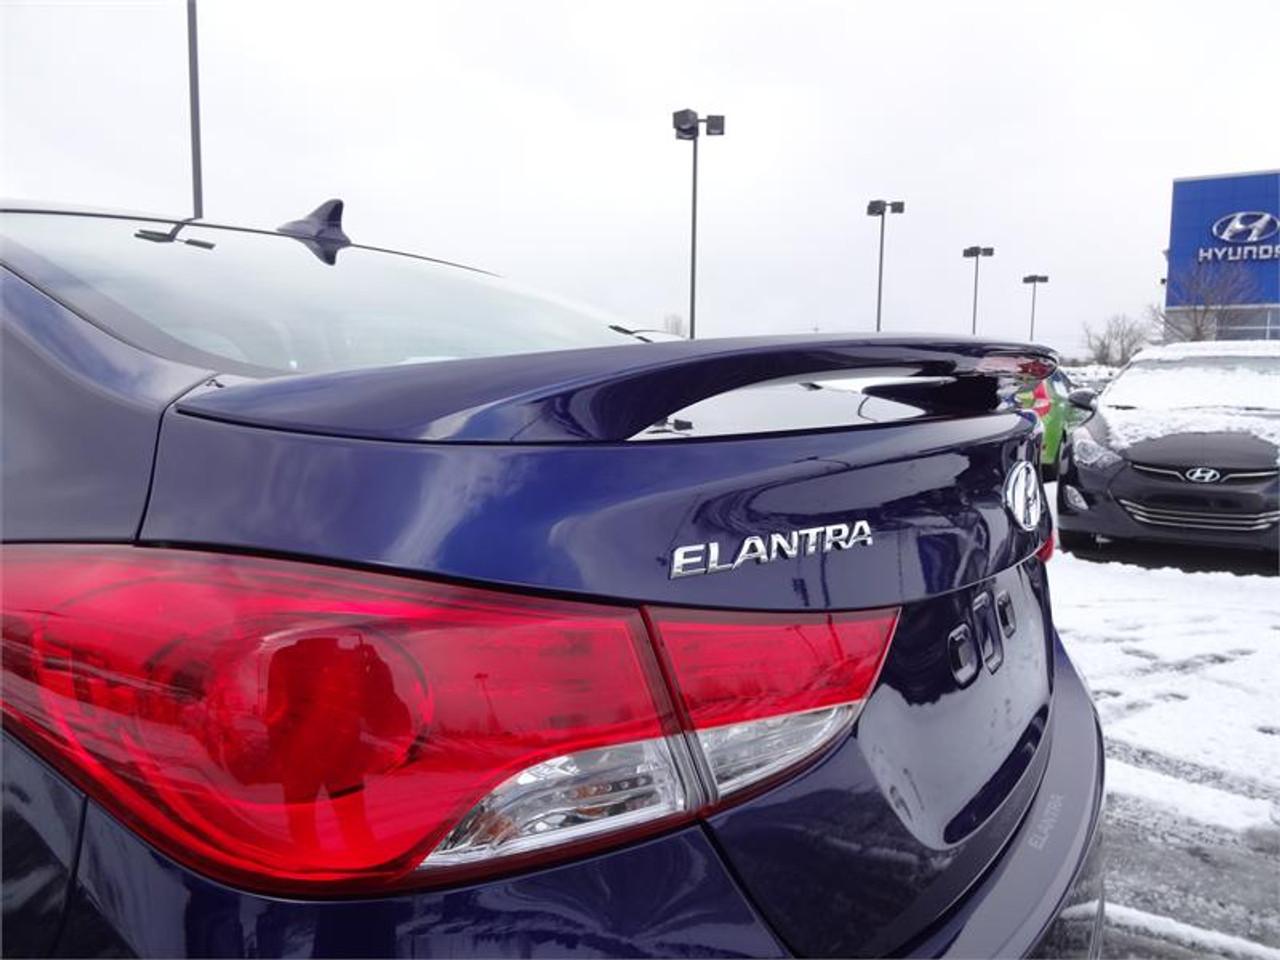 2011 2016 Hyundai Elantra Rear Spoiler Free Shipping